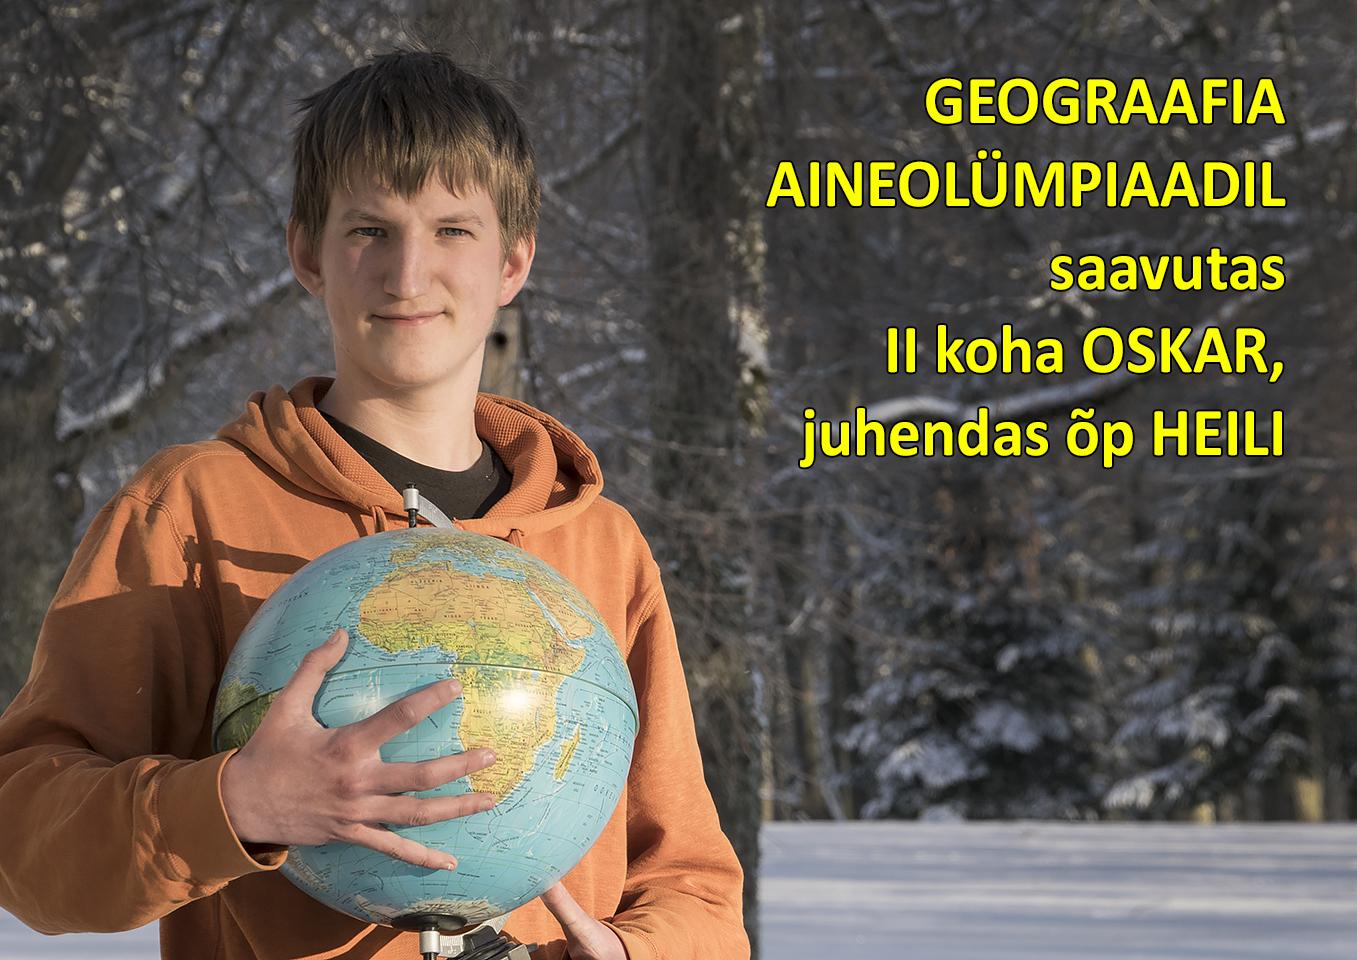 oskar_geograafia